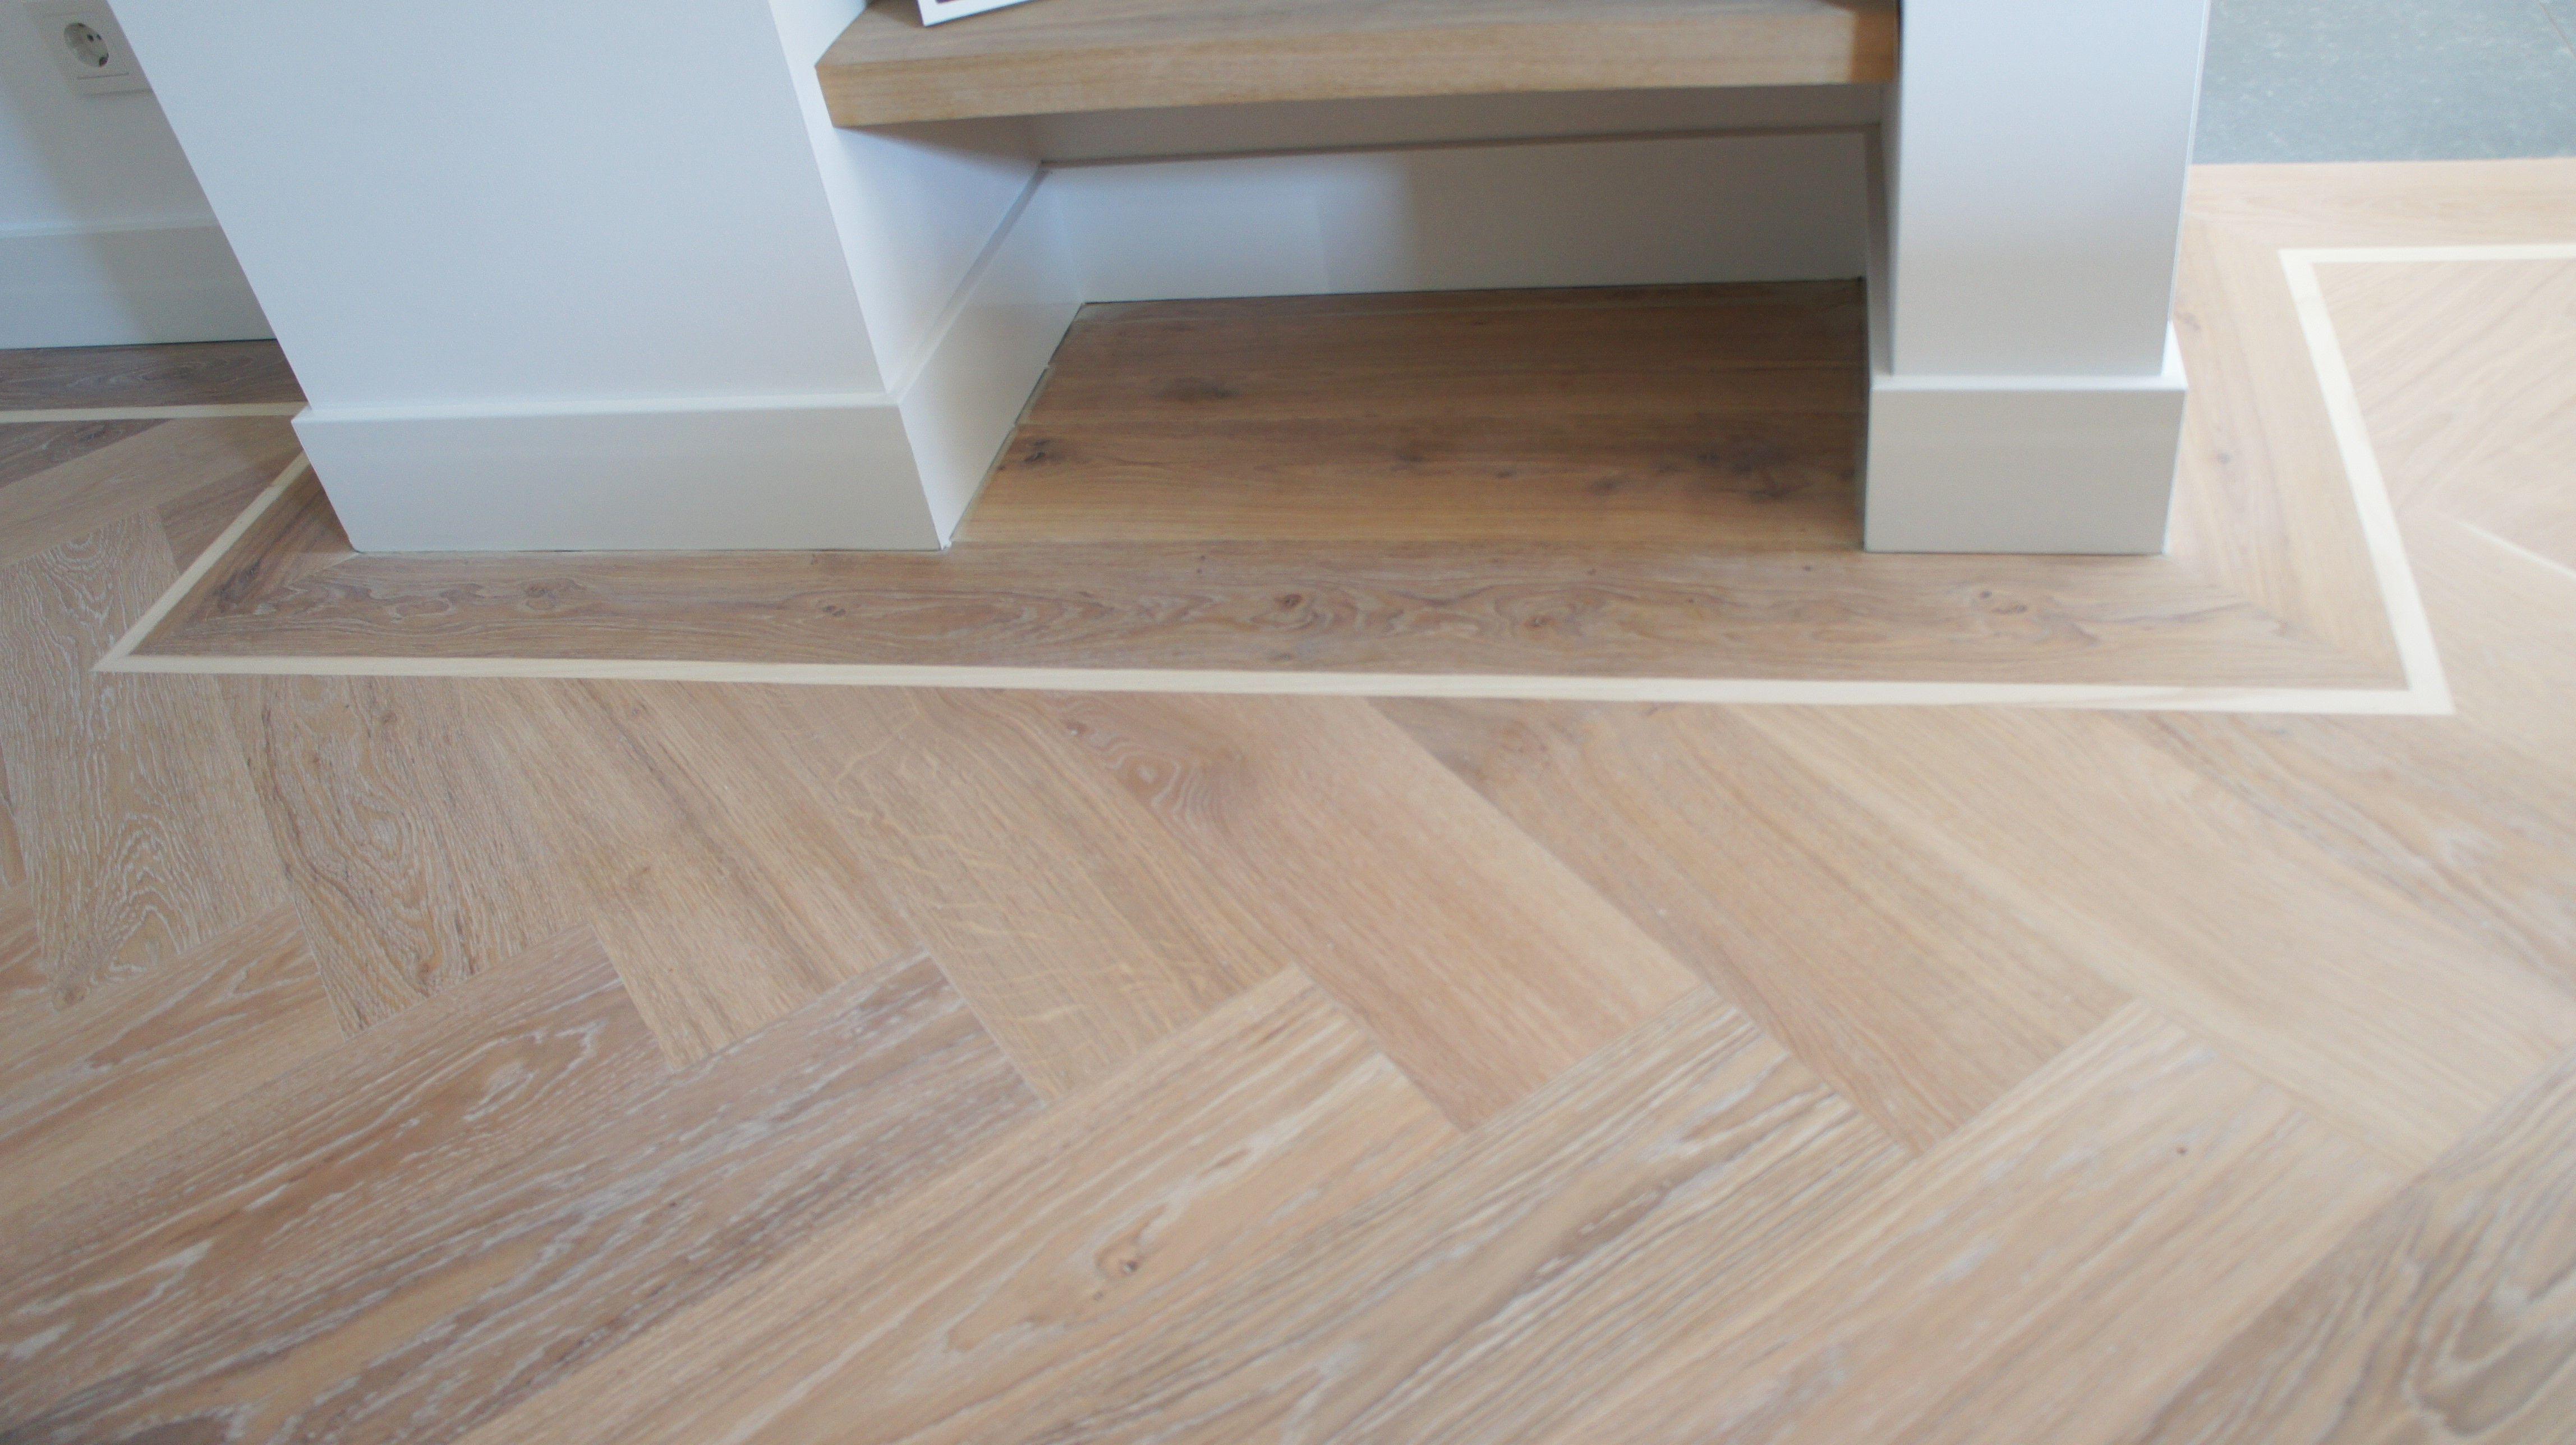 Morefloors vloeren breda europees reuze tapis visgraat vloer x